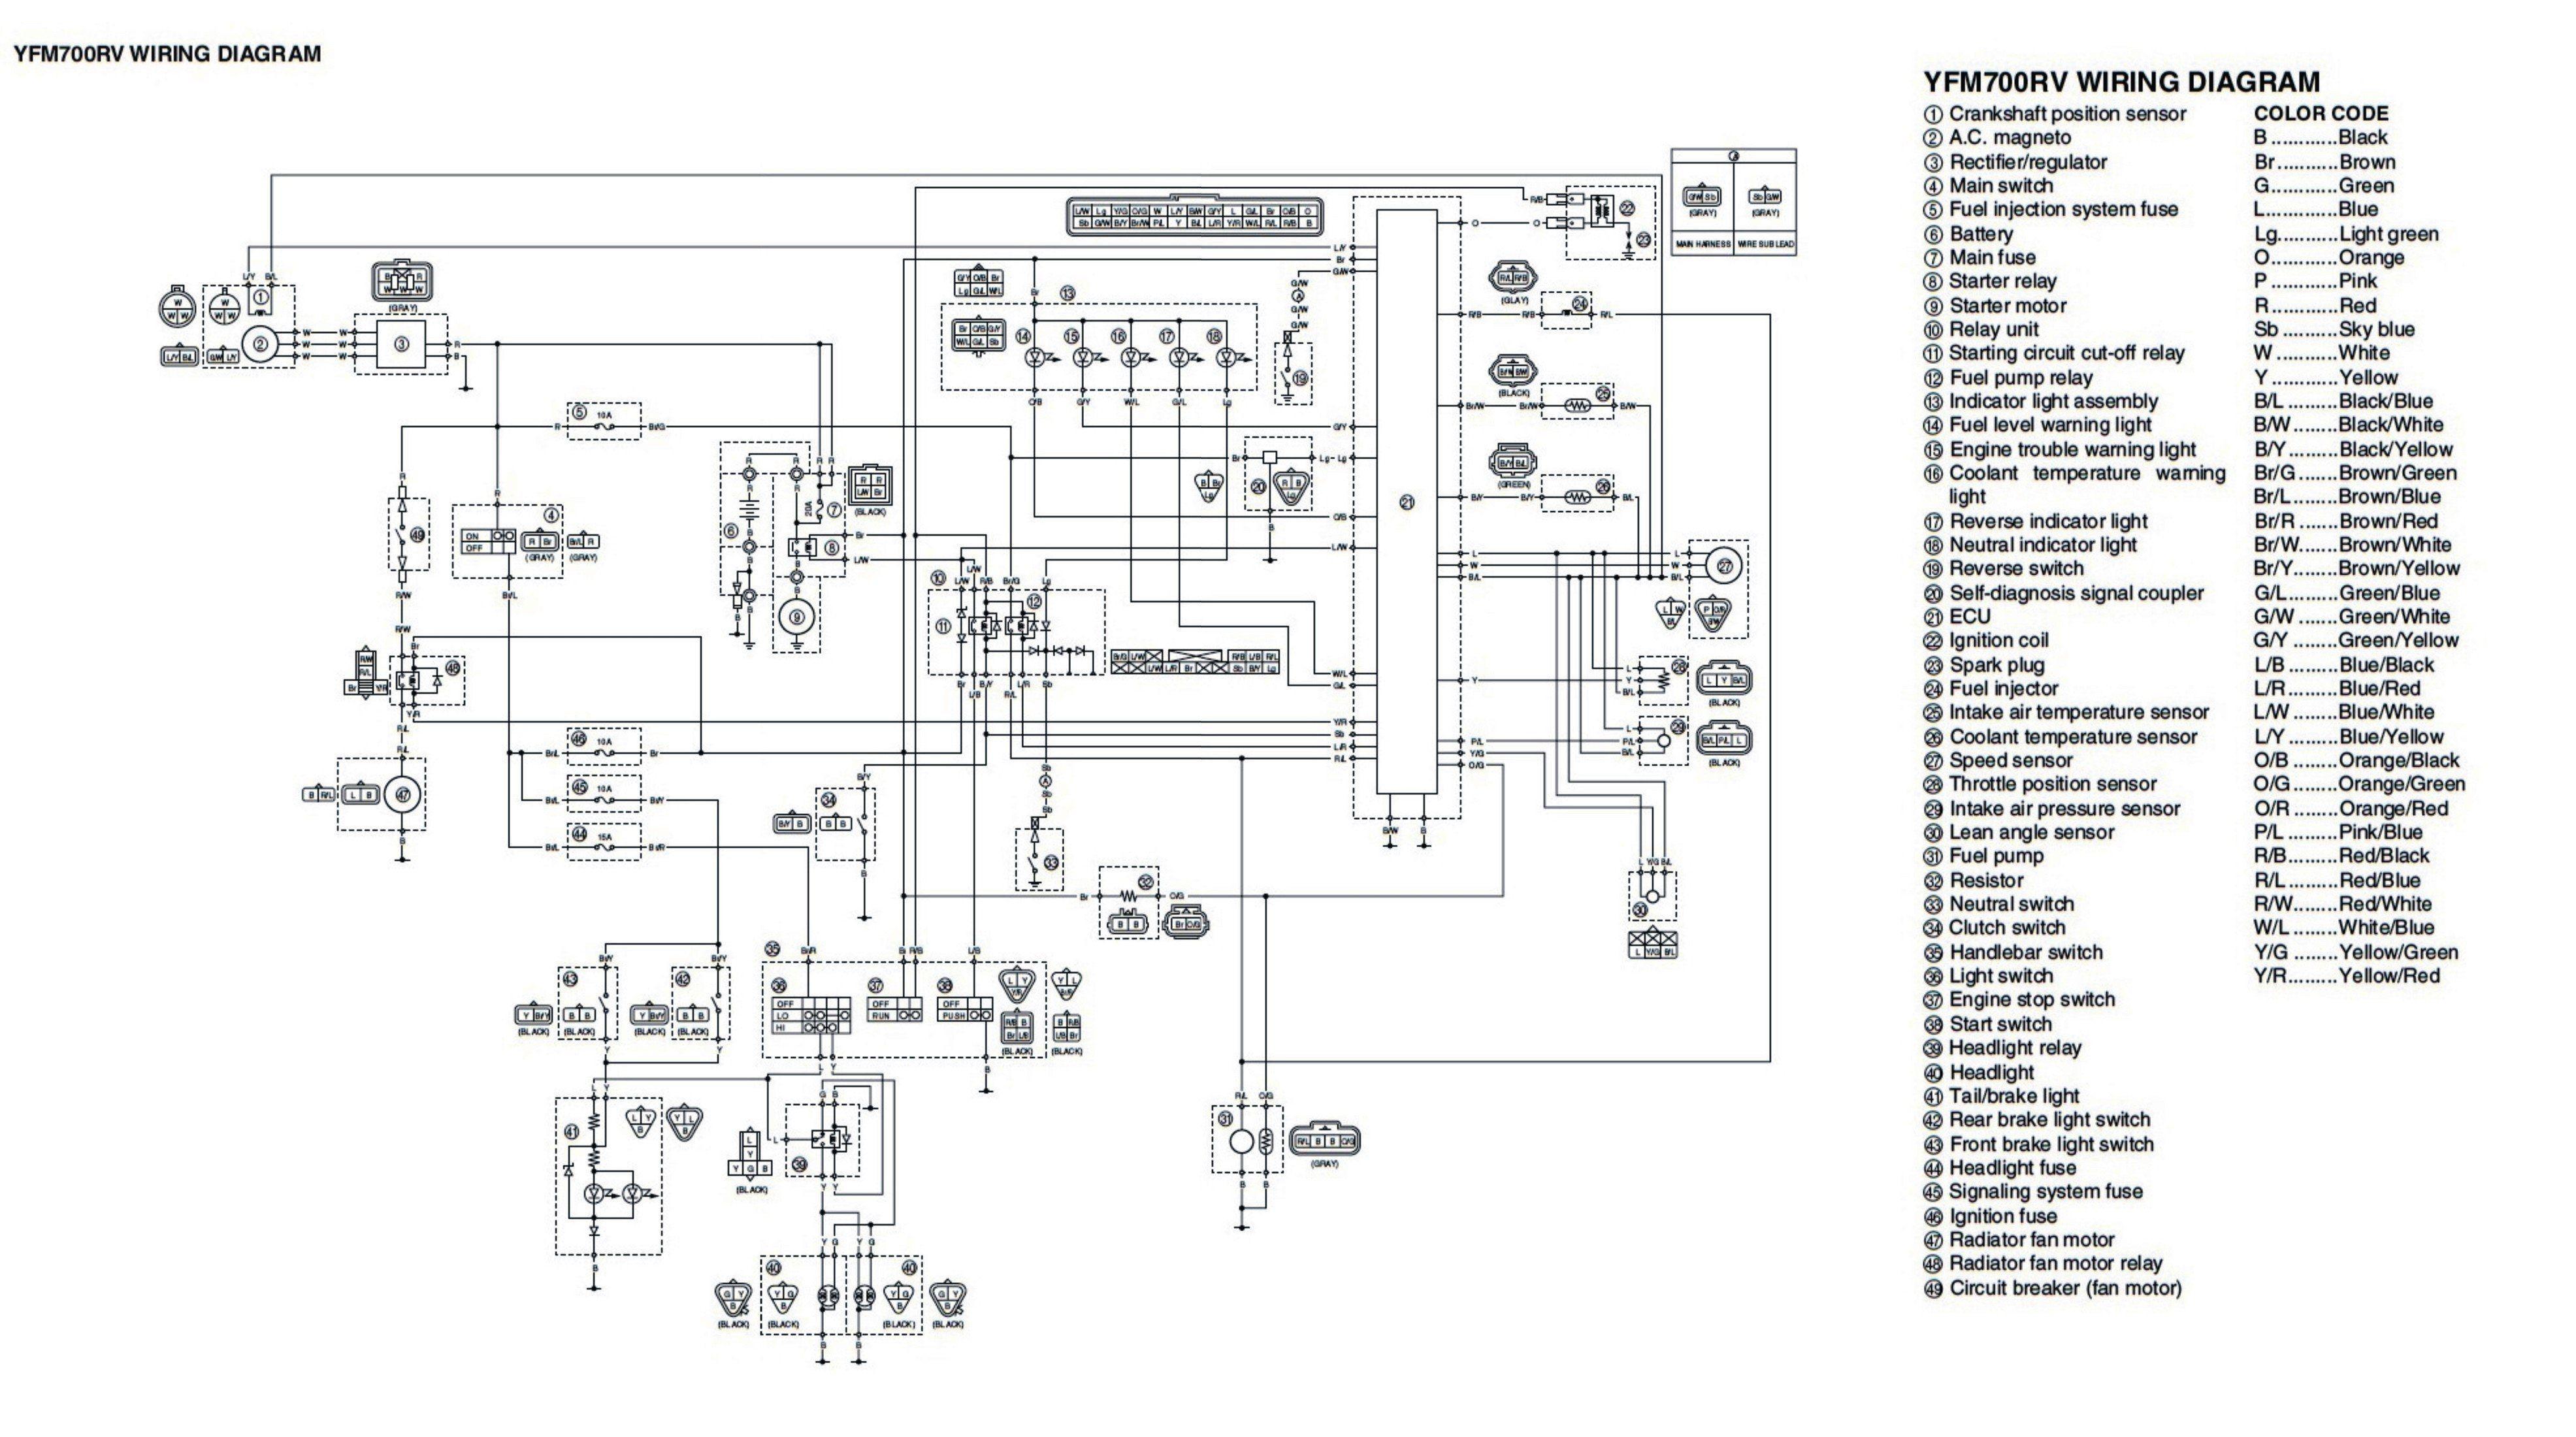 1999 yamaha banshee wiring diagram 1996 nissan maxima stereo kodiak 400 imageresizertool com